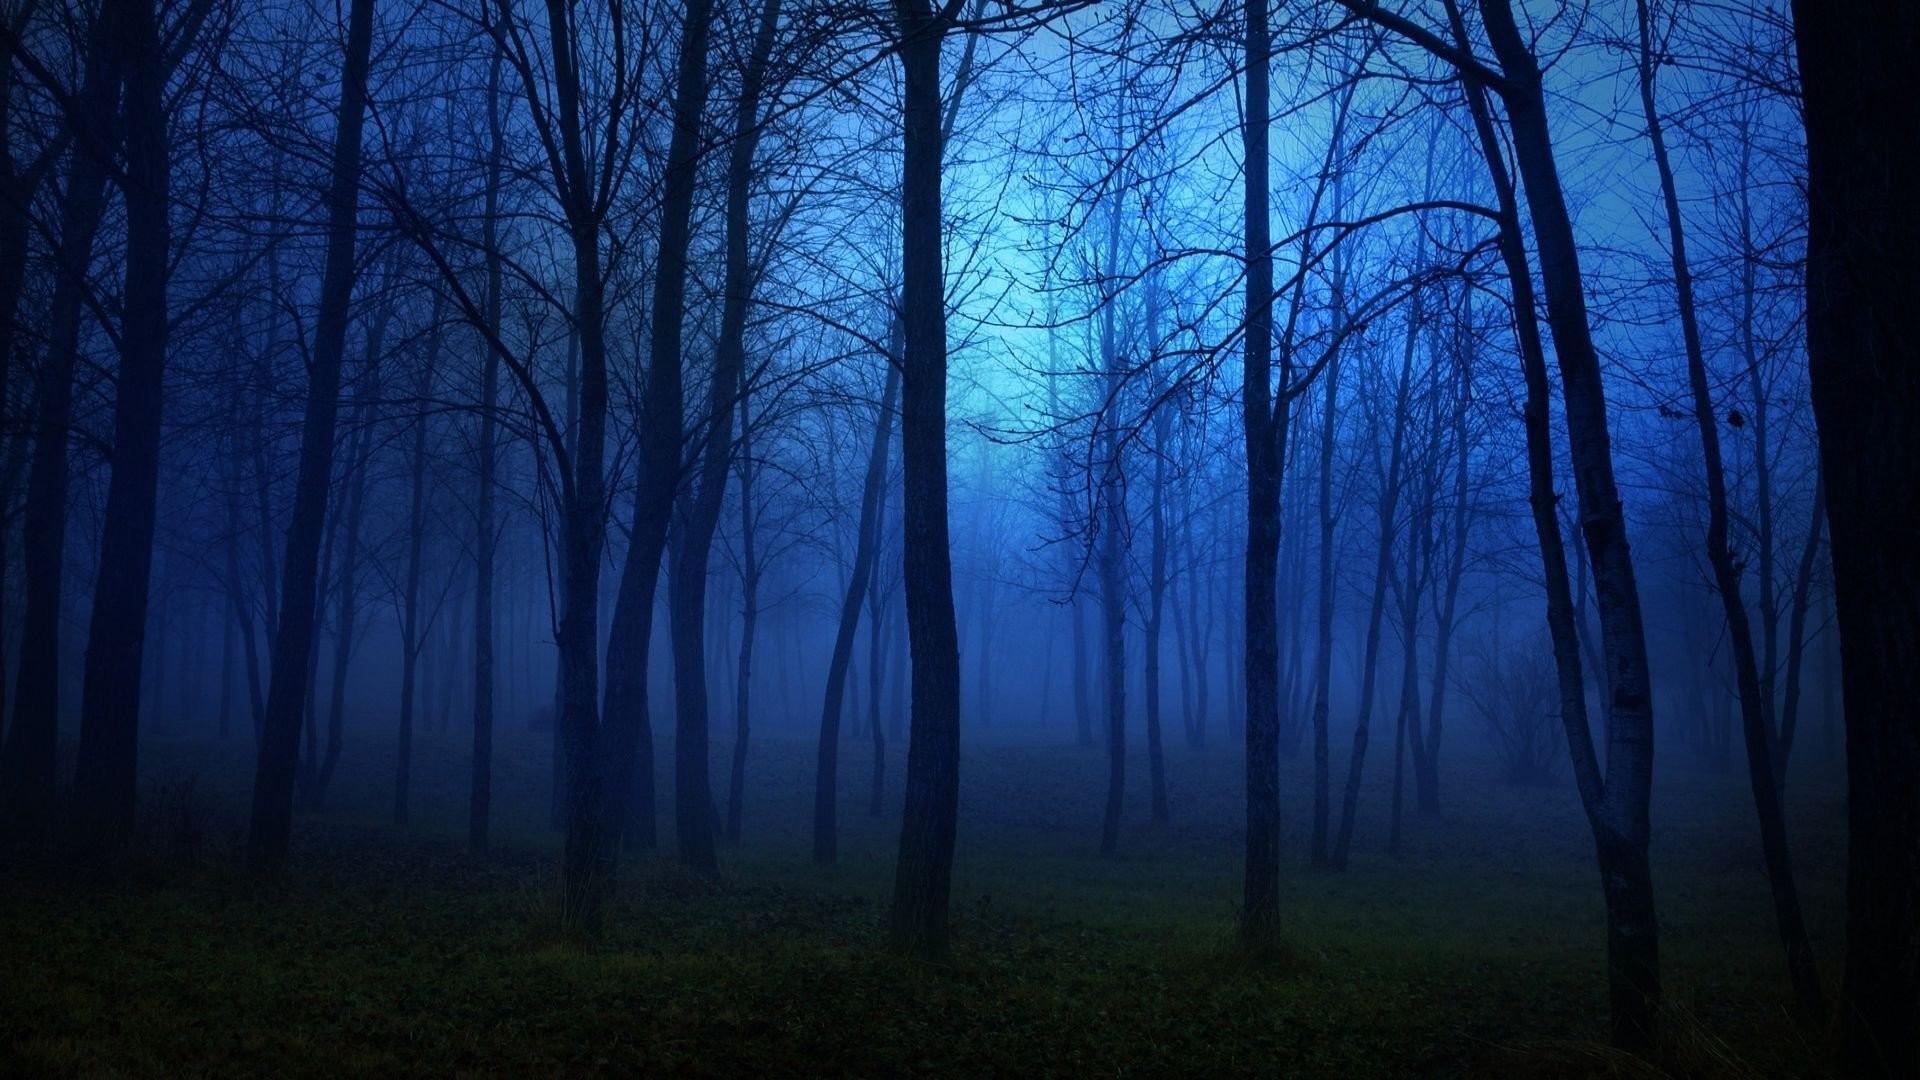 Forest nature tree landscape night fog mist dark spooky wallpaper .